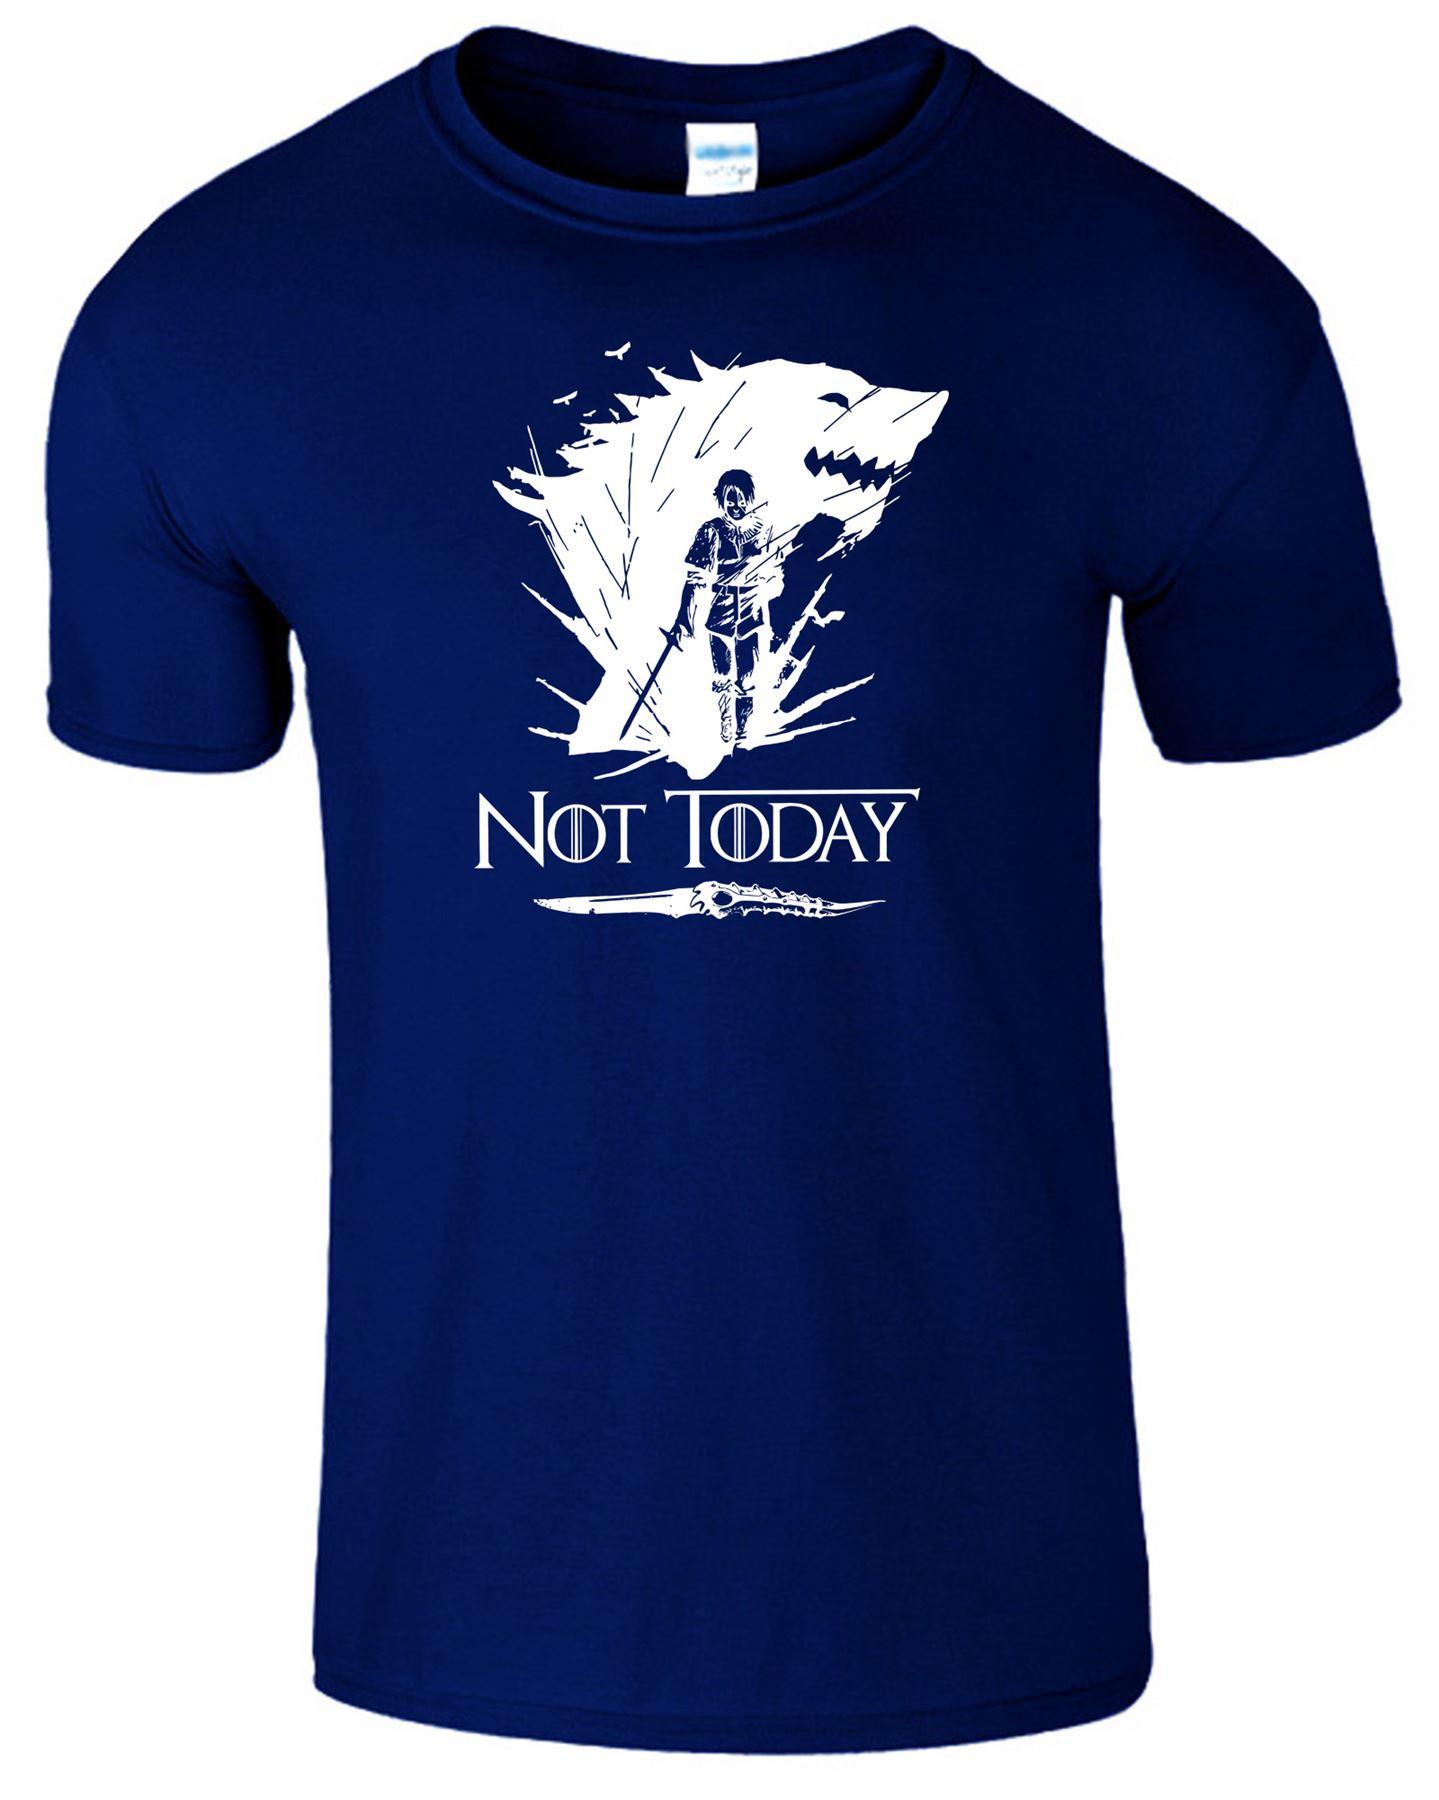 Arya-Stark-Not-Today-T-Shirt-Mens-Game-Season-Womens-Shirt-Adults-Unisex-Fit Indexbild 33